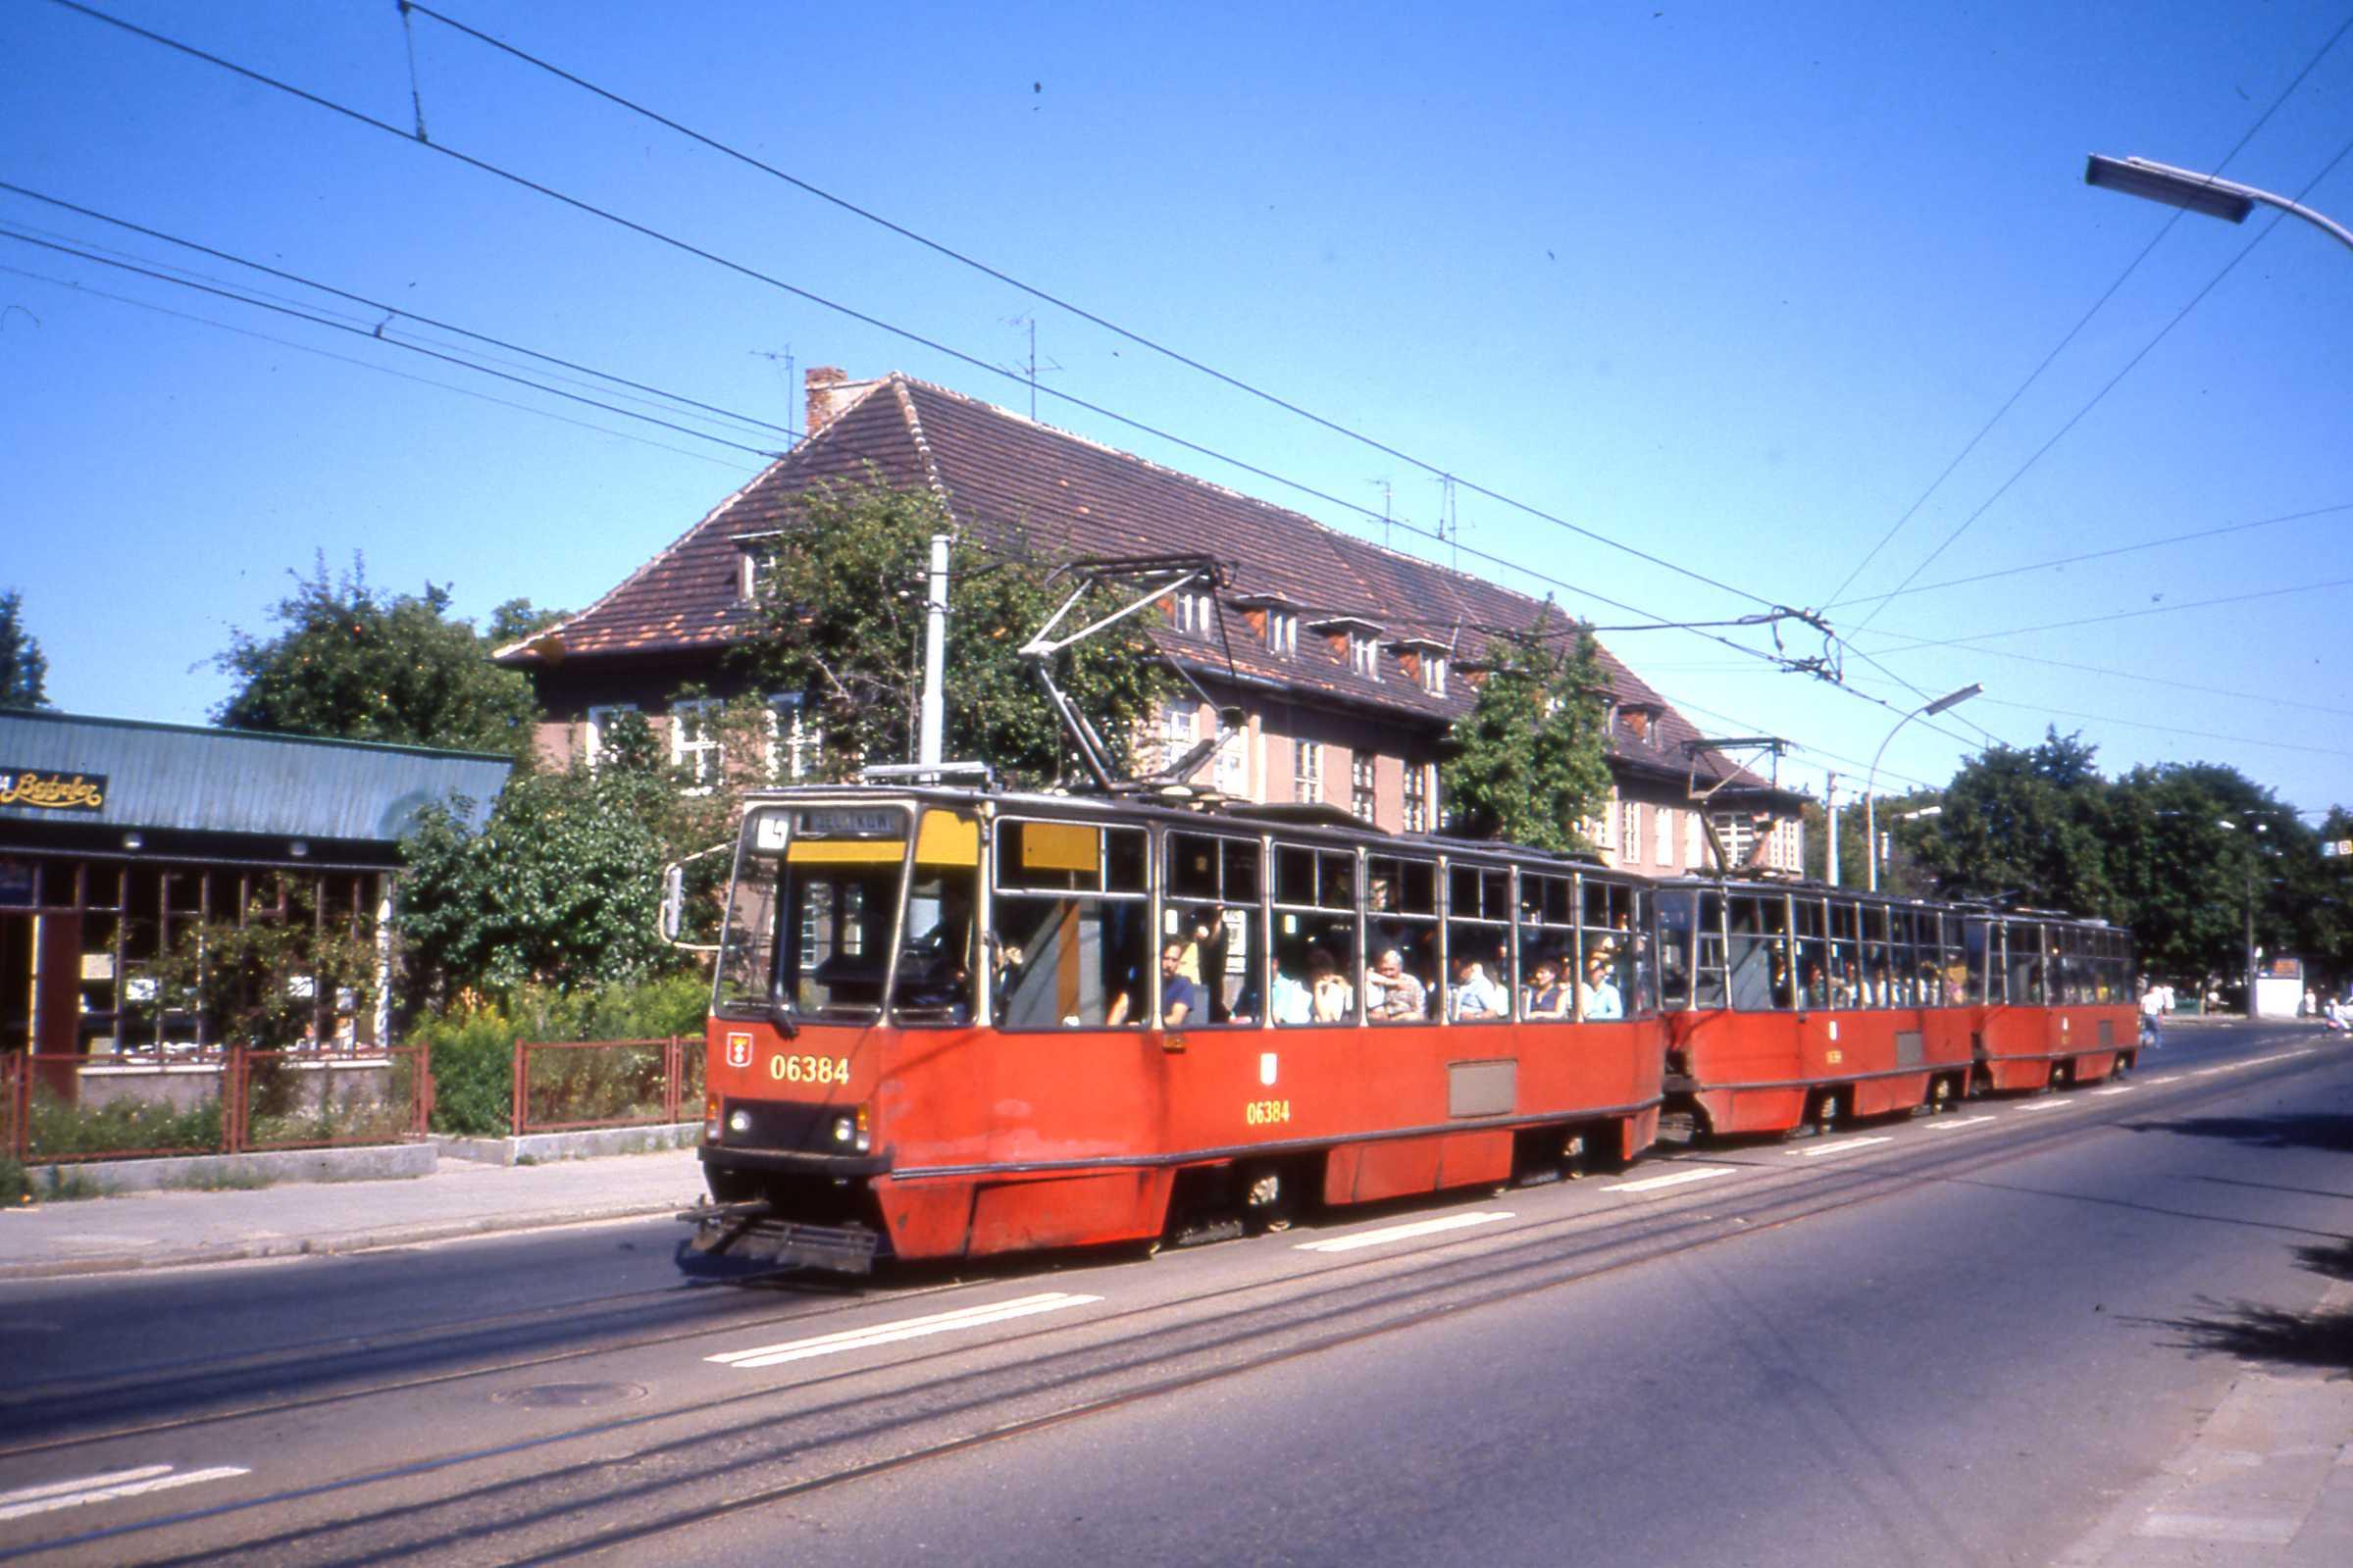 File Gdańsk Tramwaj Aug 1990 Konstal 105na Tram 06384